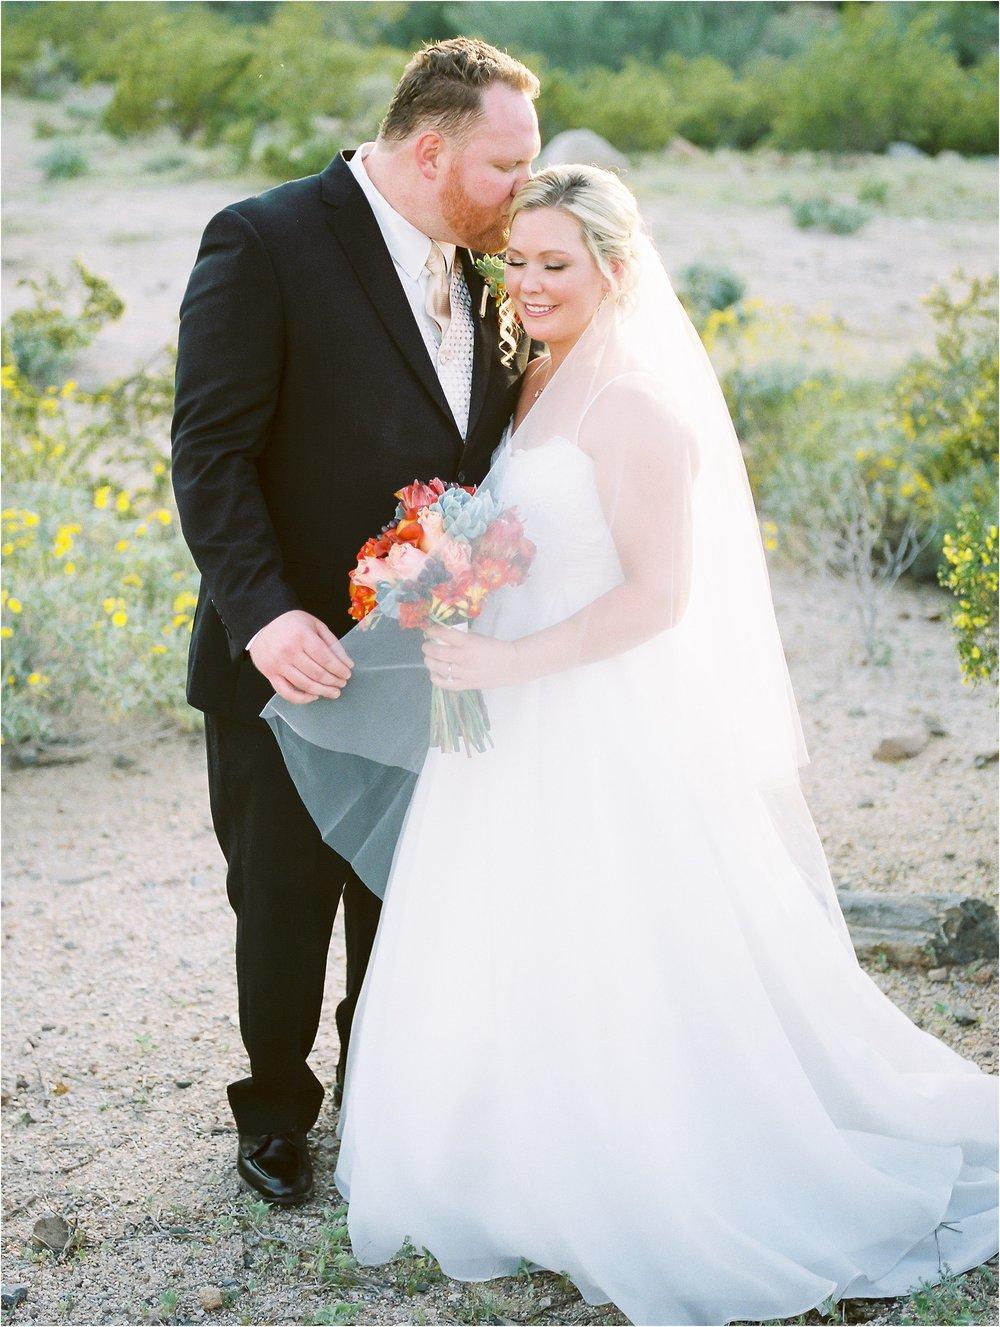 Sarah Jane Photography Film Hybrid Scottsdale Phoenix Arizona Destination Wedding Photographer Scott and Rachel_0031.jpg